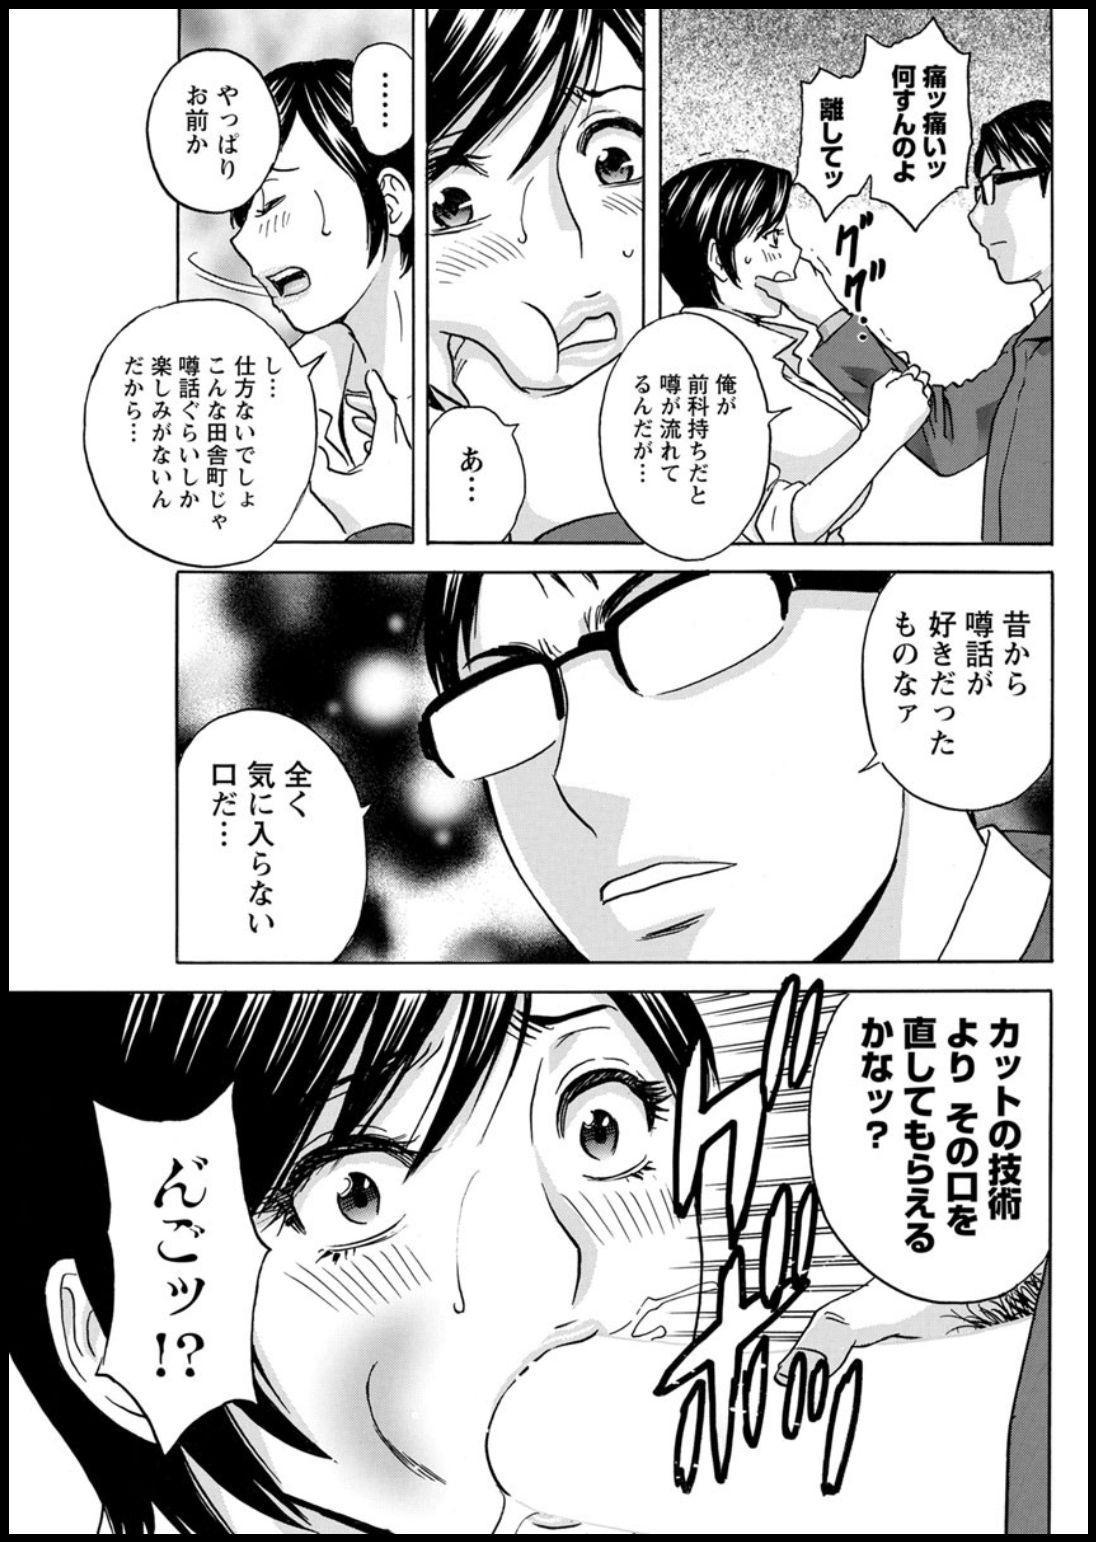 [Hidemaru] Yurase Bikyonyuu! Hataraku J-Cup Ch. 1-5 [Digital] 82